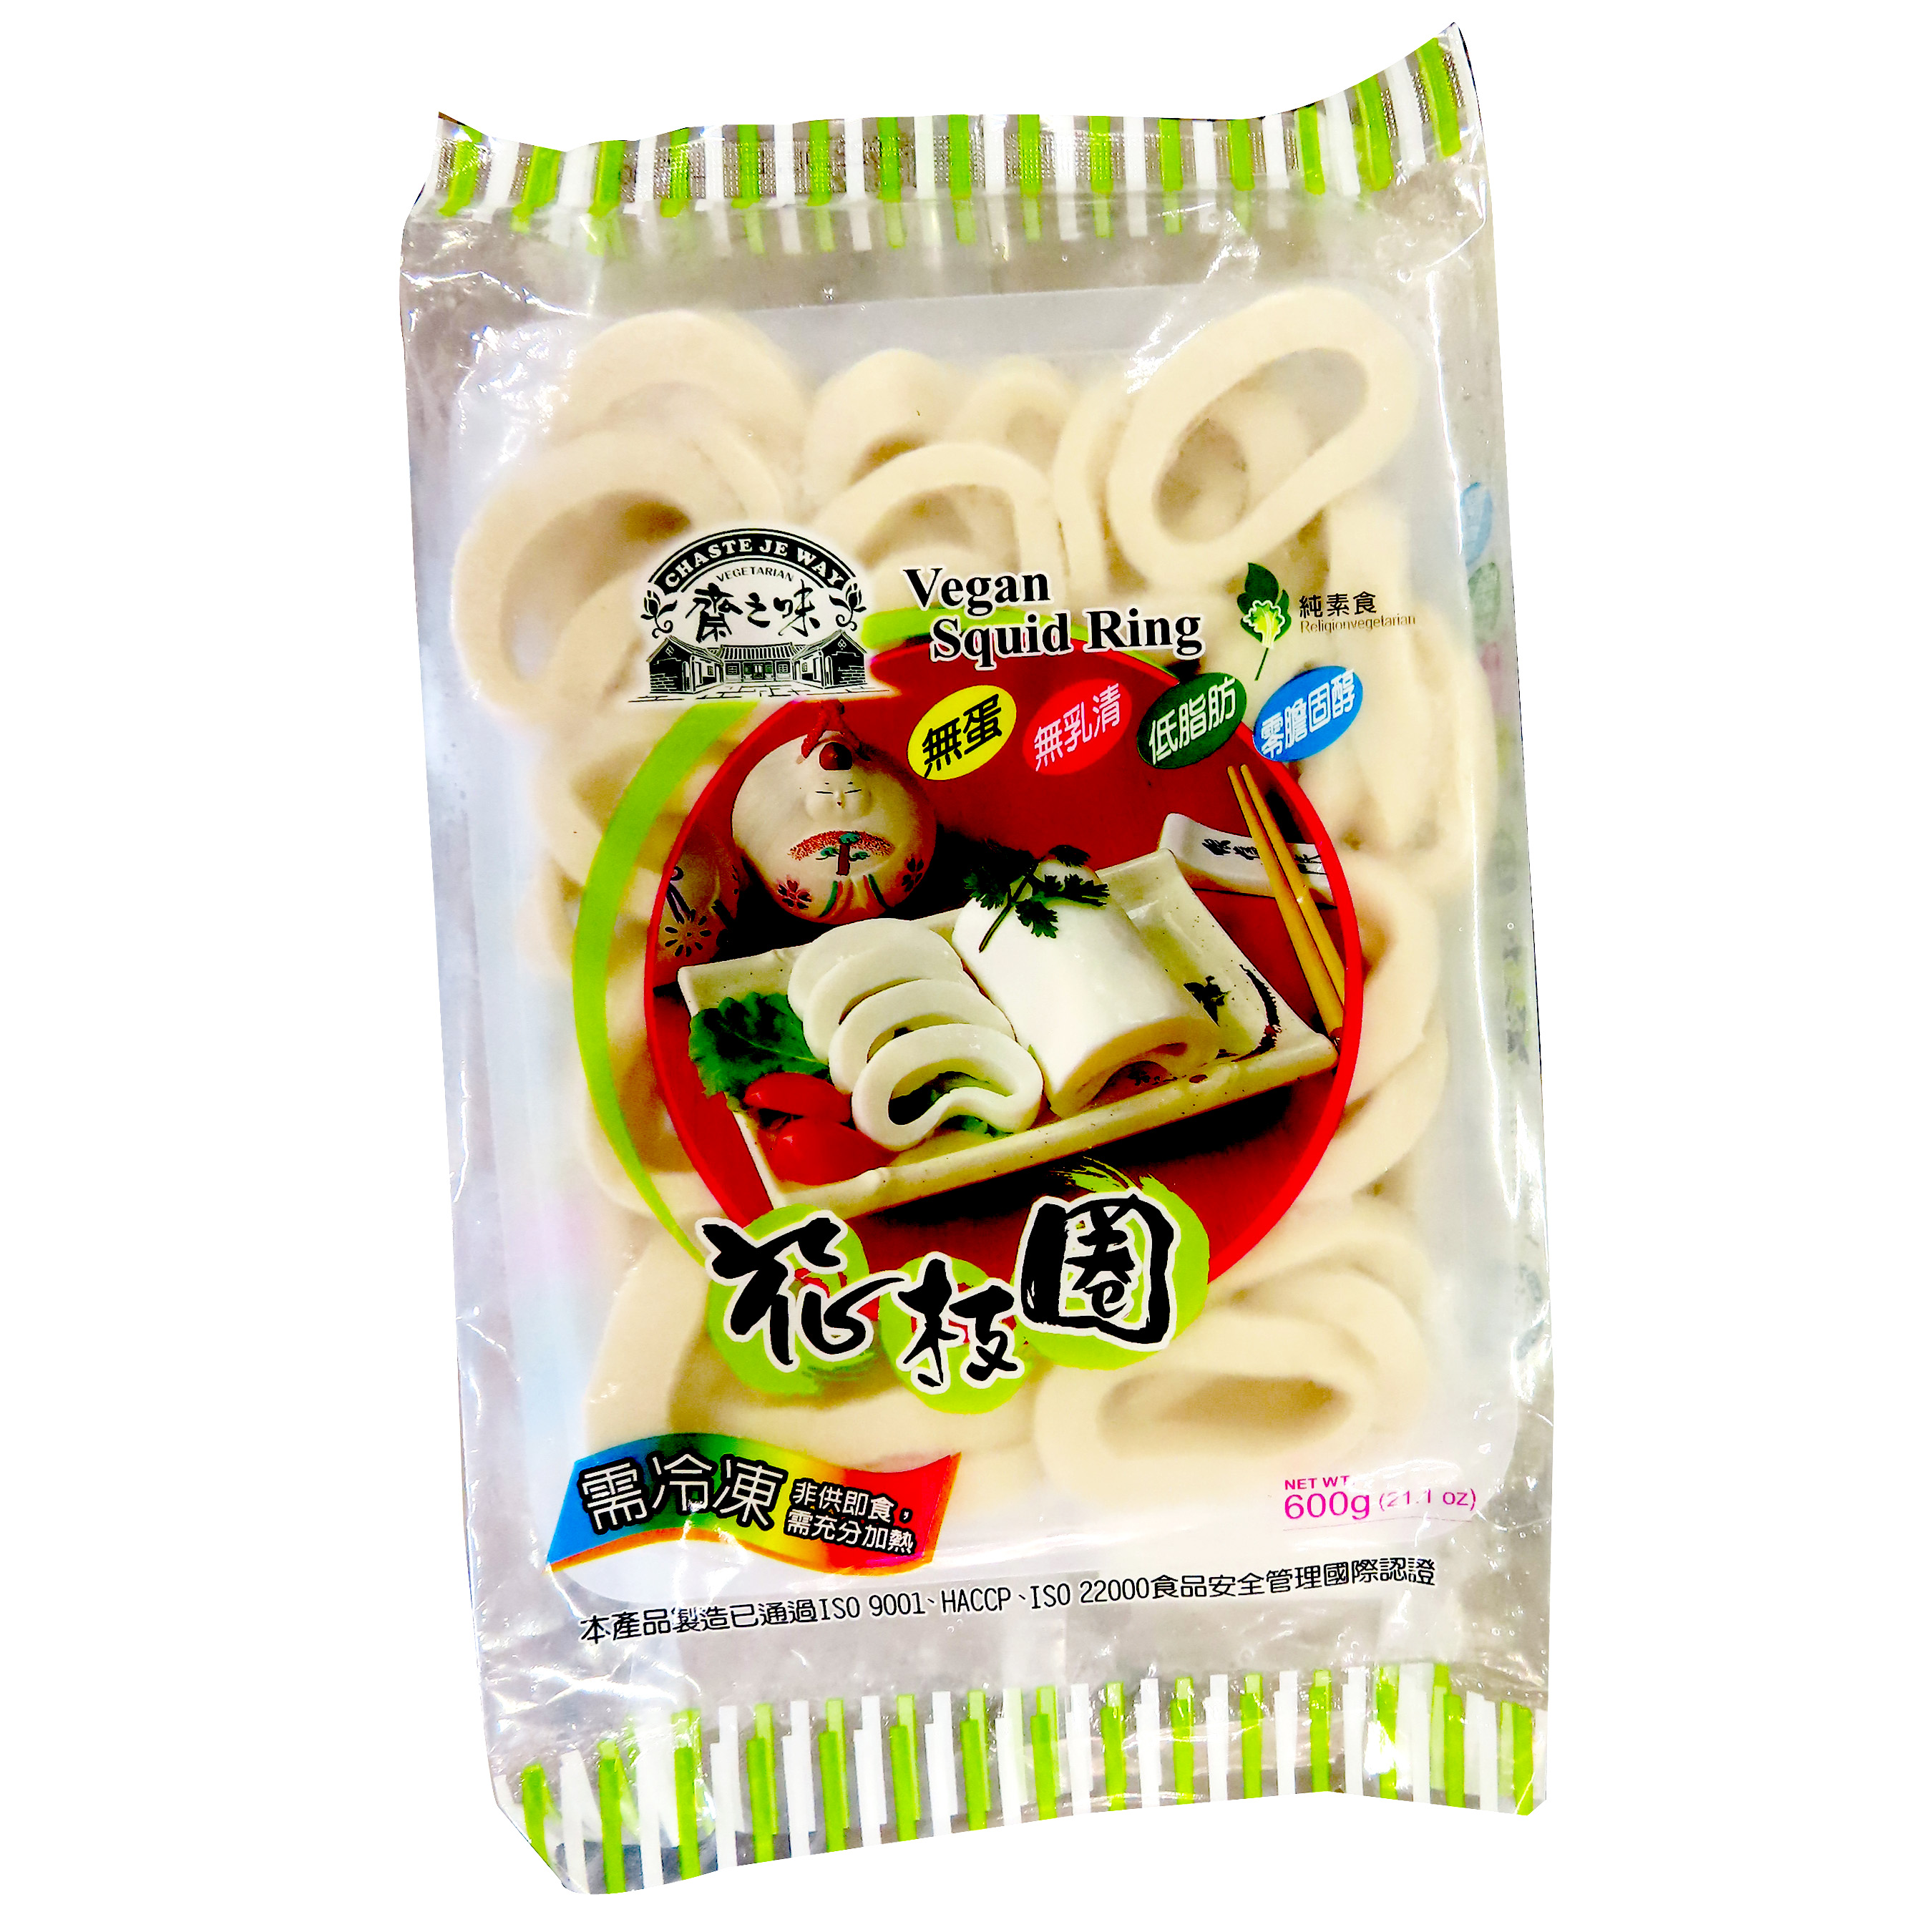 Image Vegetarian Squid Ring 斋之味-花枝圈 600grams